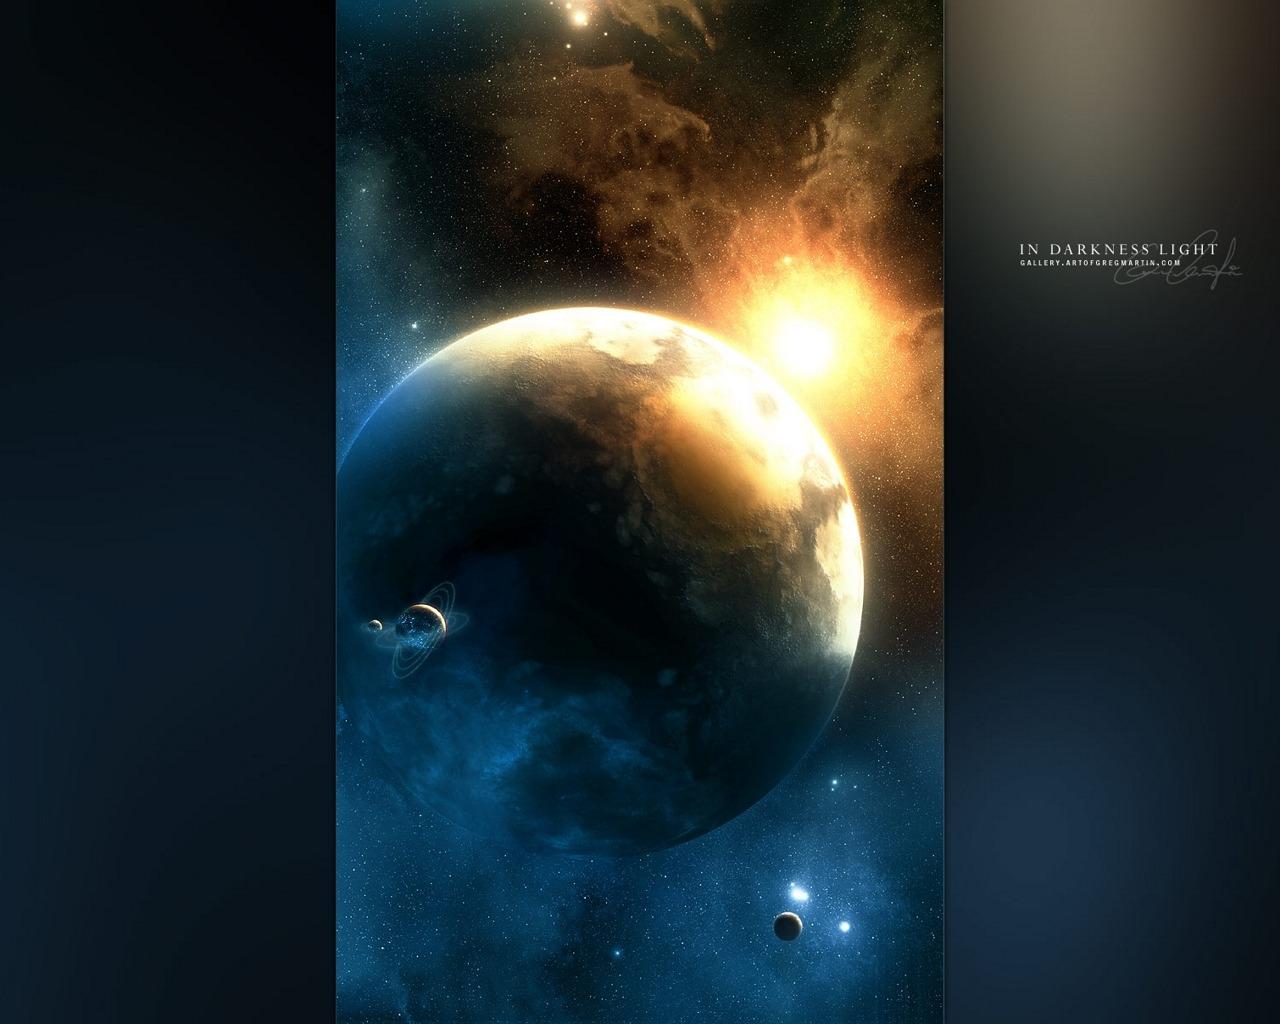 http://4.bp.blogspot.com/-s12AAPlG7aQ/T6HdE9mArXI/AAAAAAAACqI/0PbMIgqBWtk/s1600/Space%2Bgalaxy%2Bwallpaper%2BHD%2B76.jpg